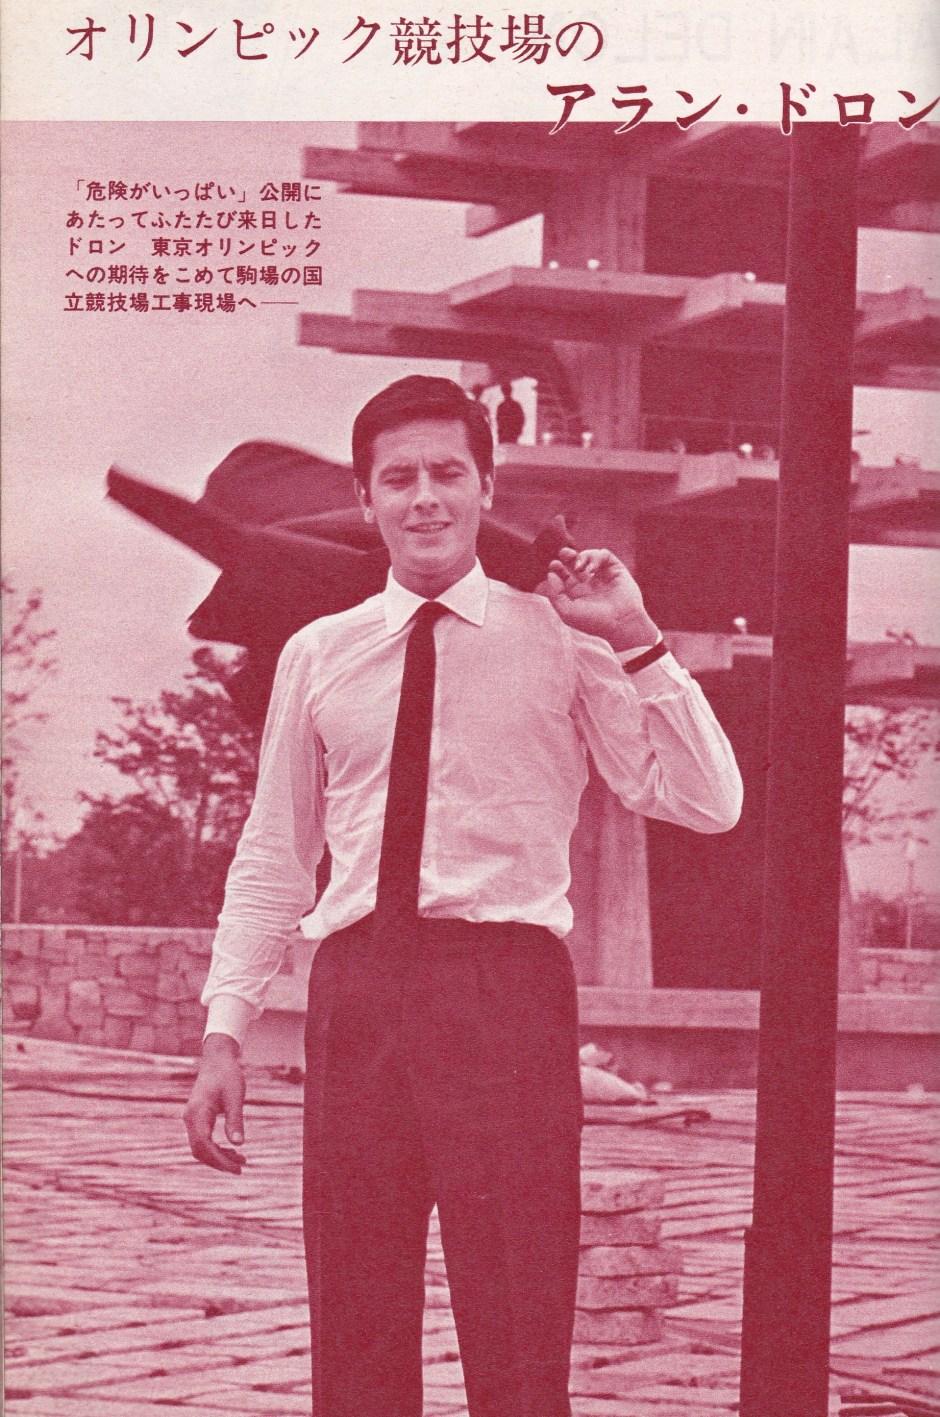 Eiga no Tomo_August 1964_Alain Delon at Komazawa